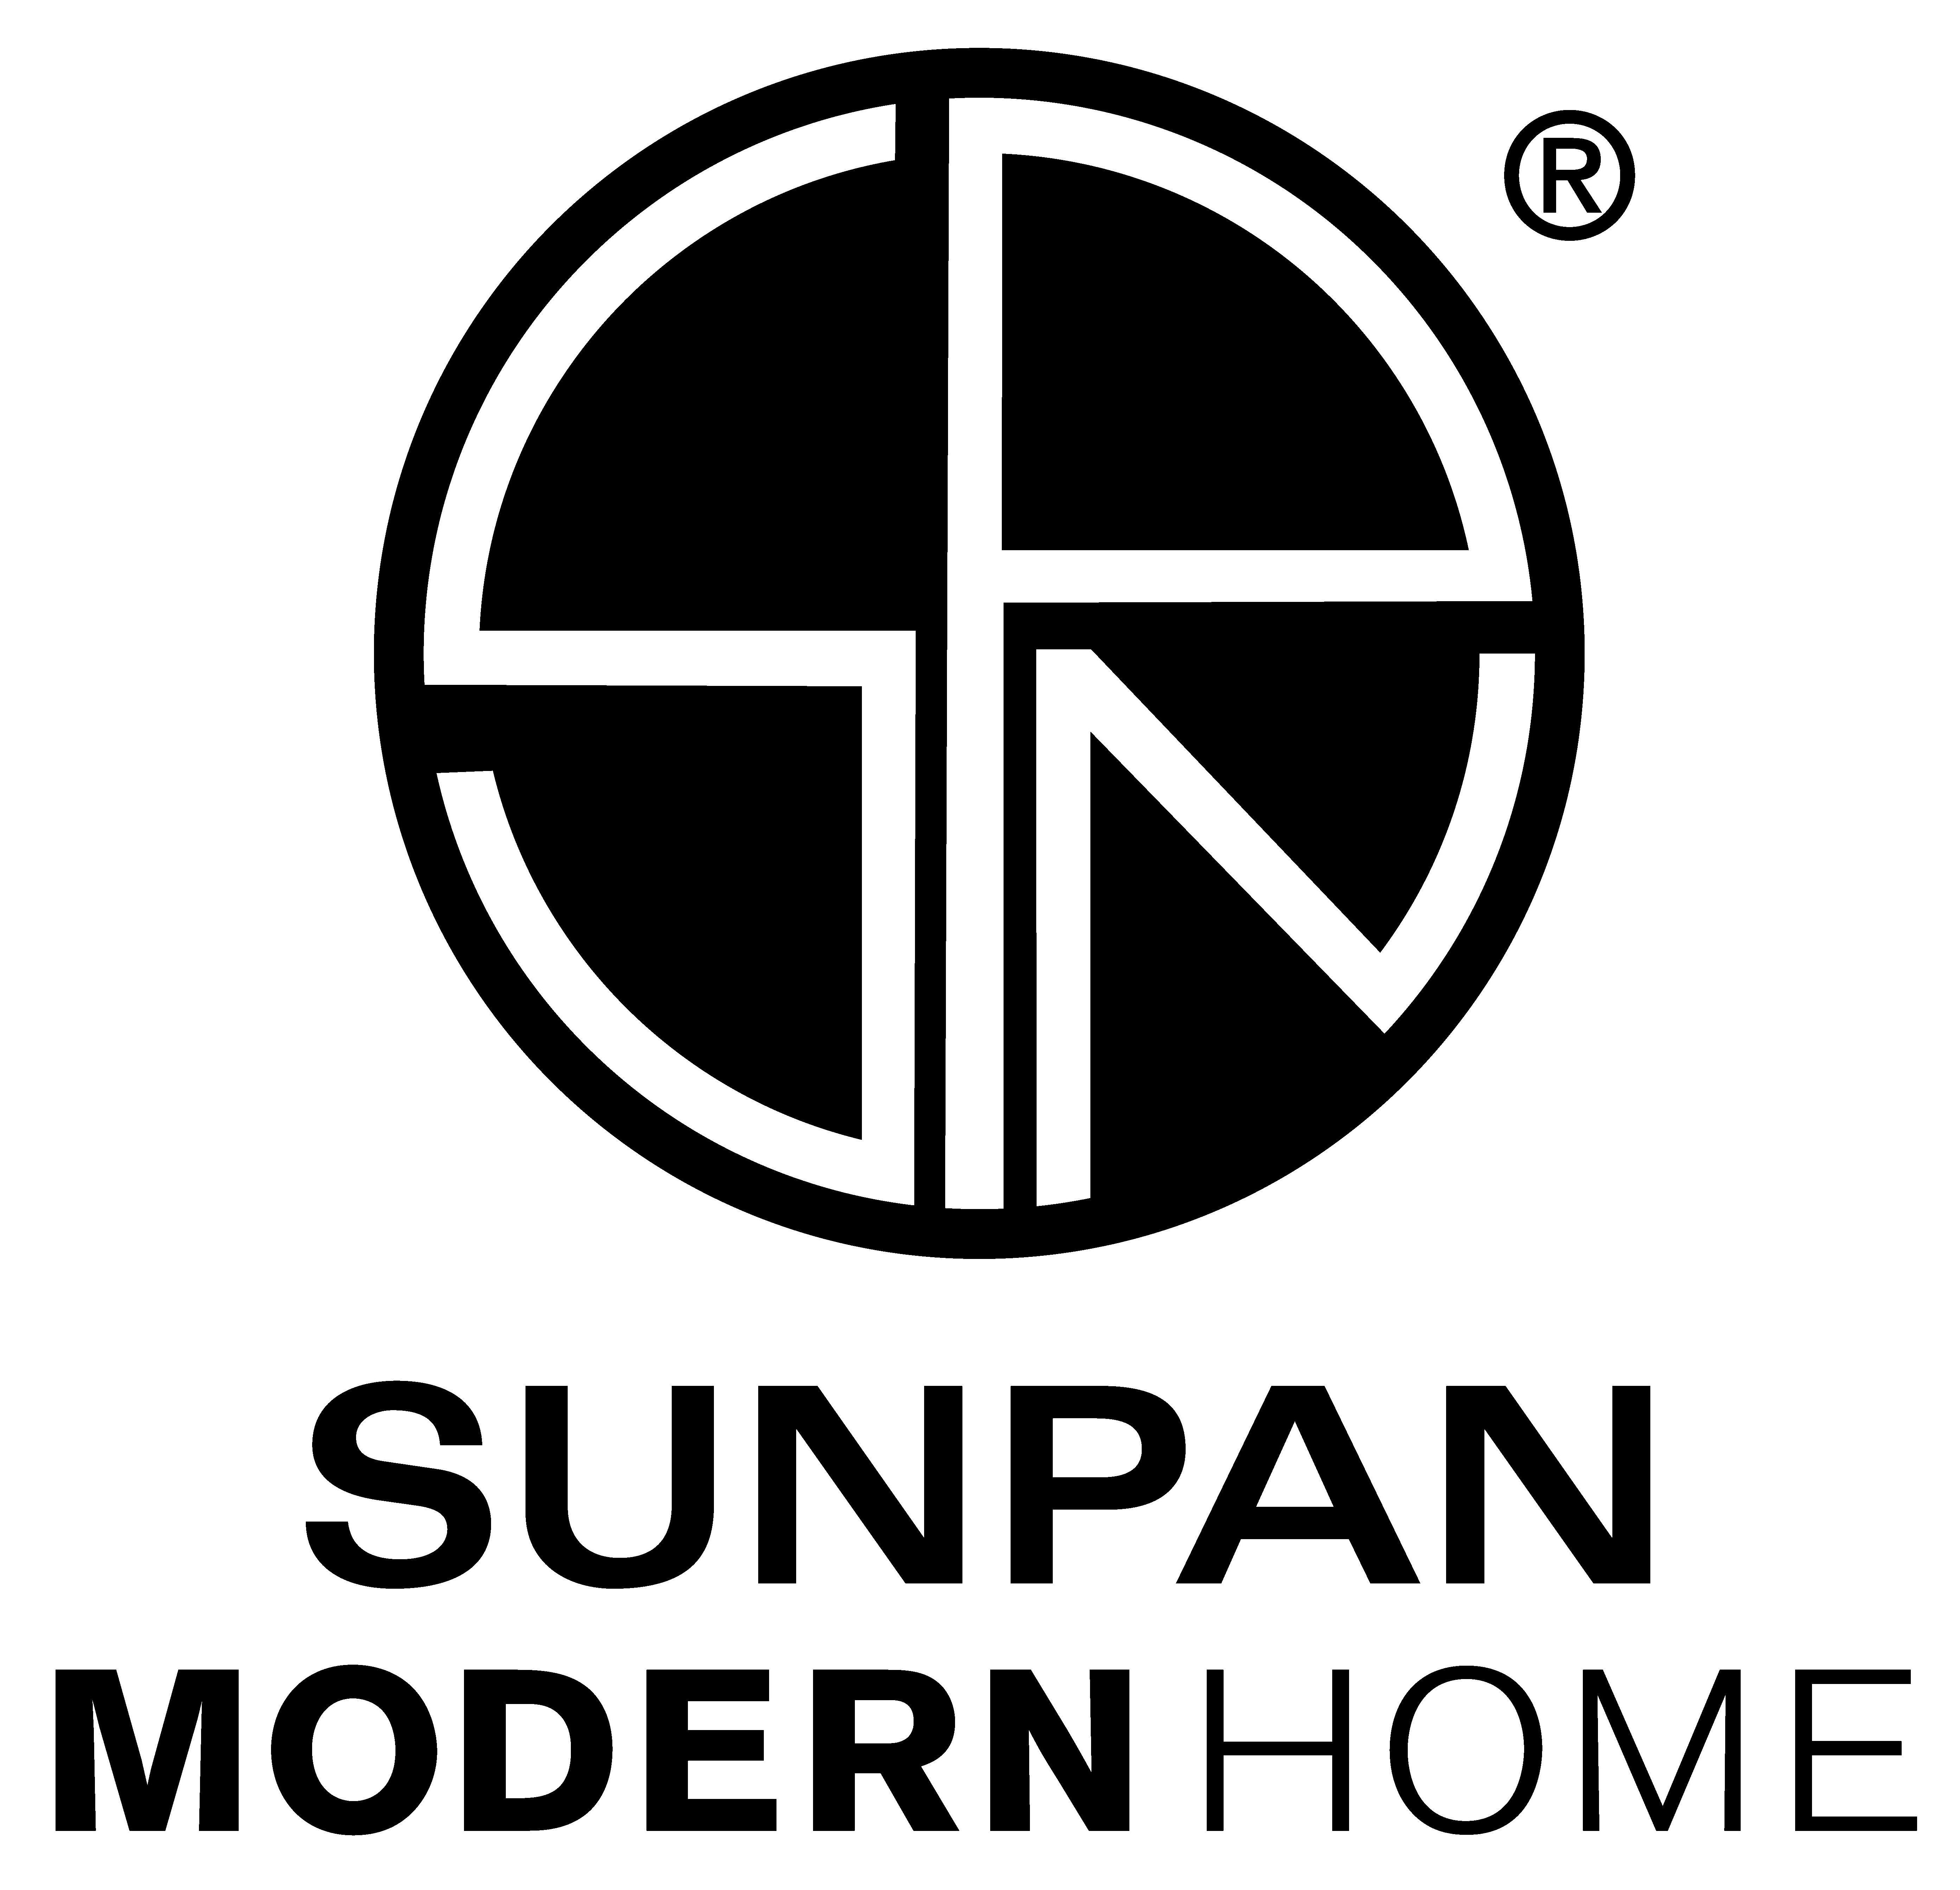 Sunpan Modern Home